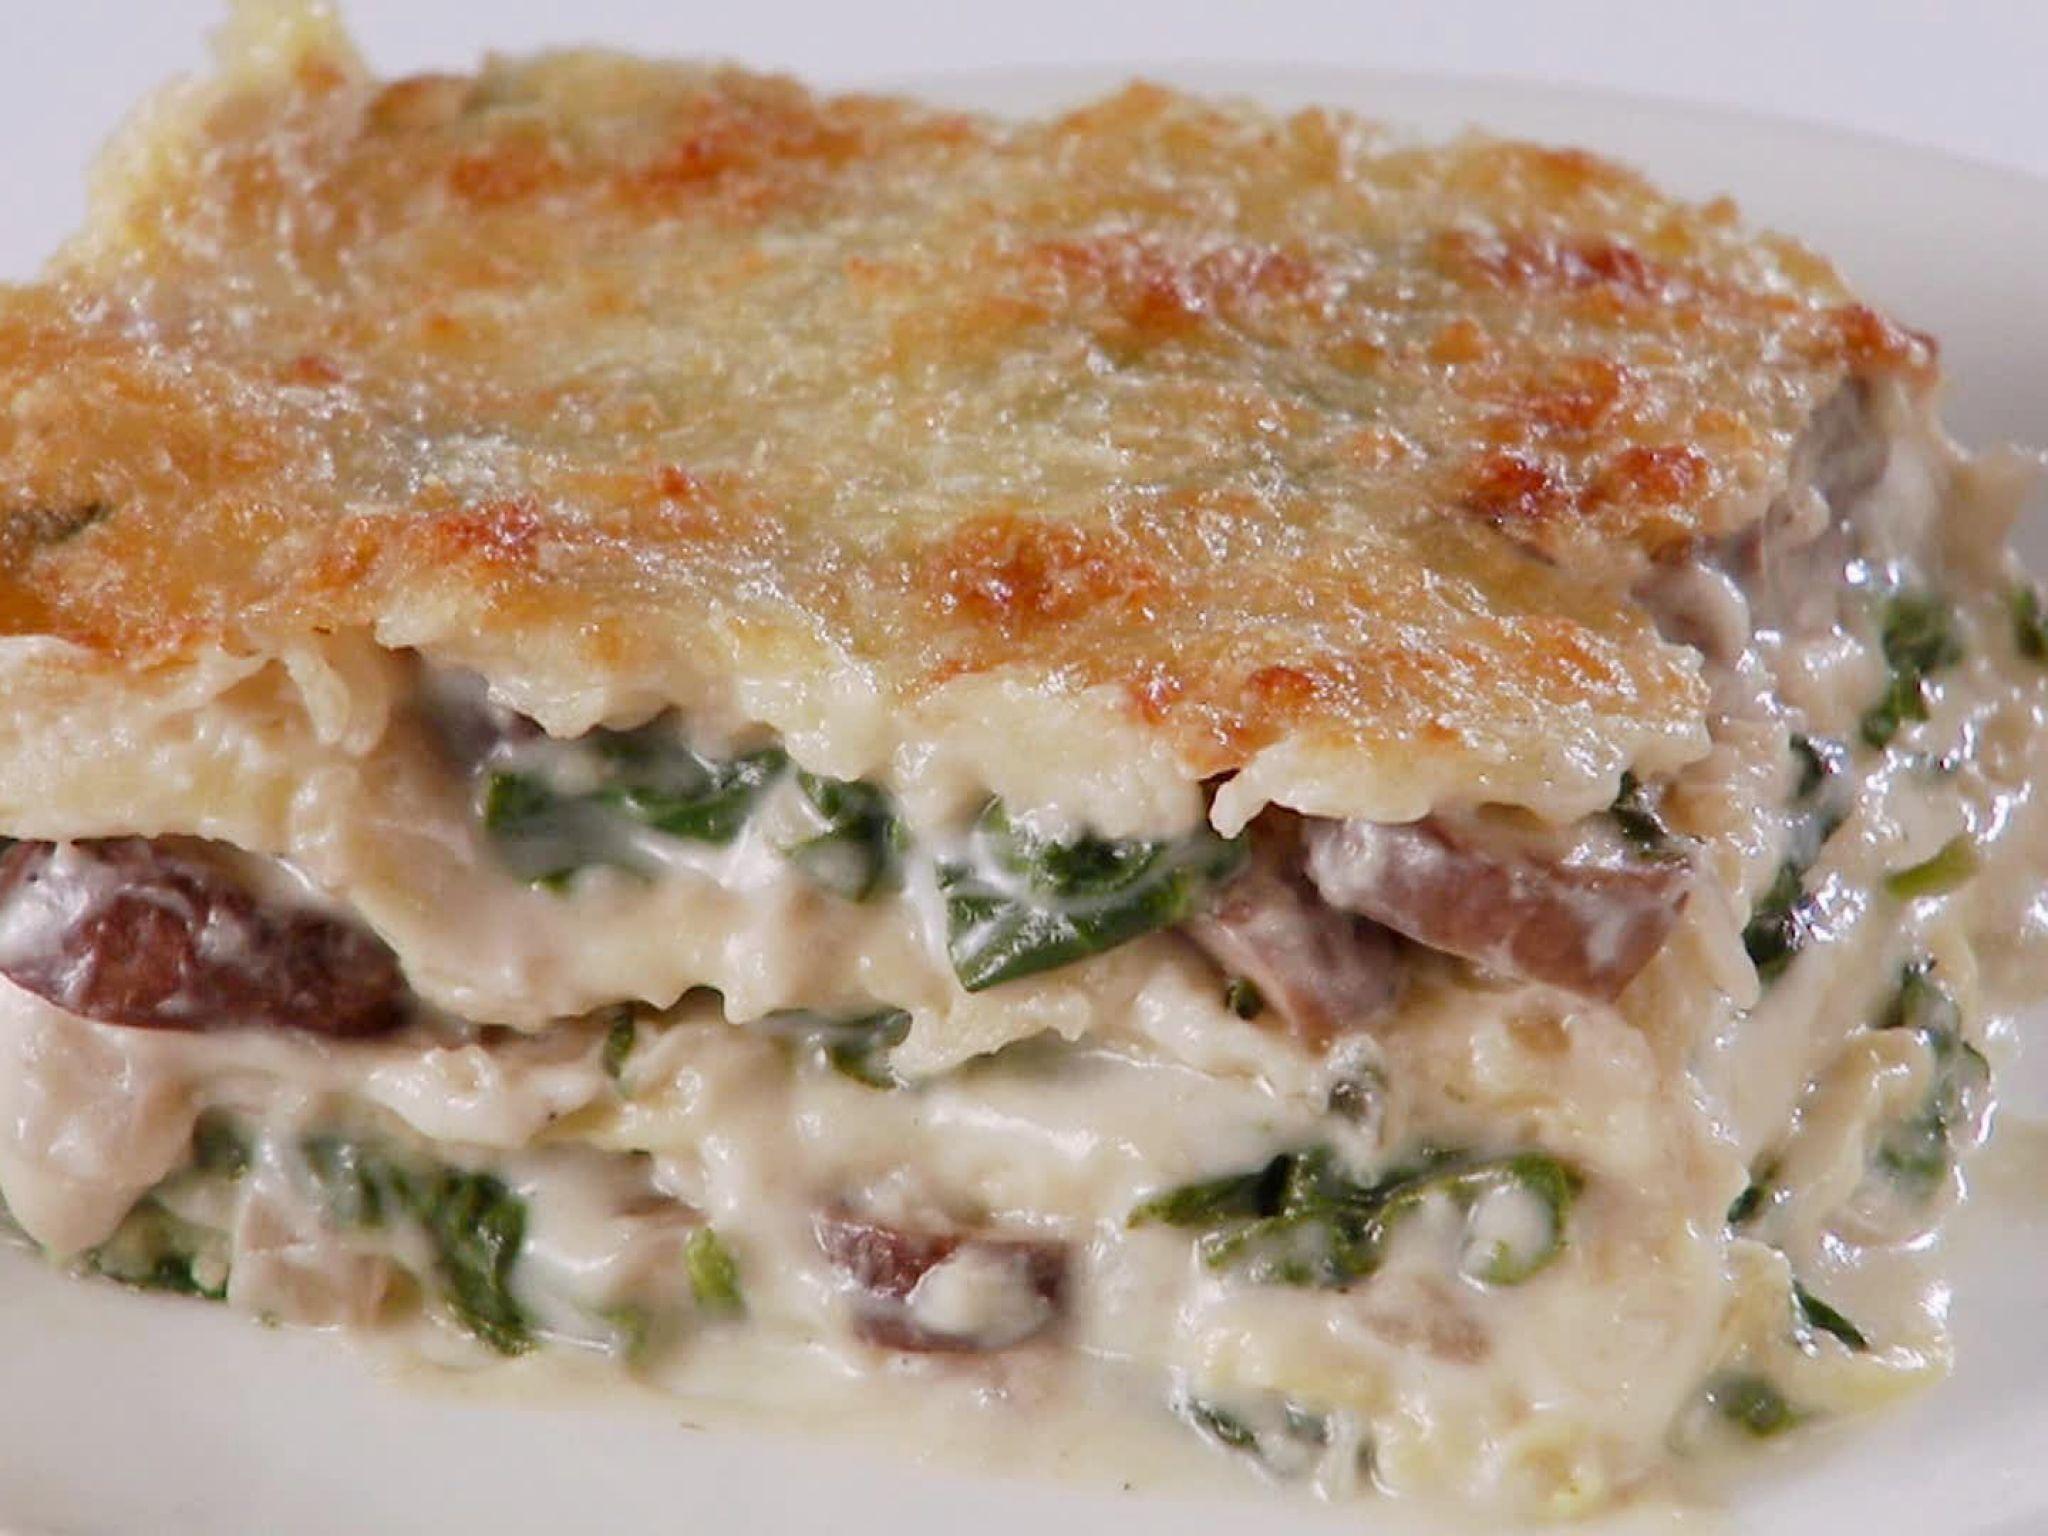 Creamy spinach and mushroom lasagna recipe mushroom lasagna creamy spinach and mushroom lasagna food network recipeschef forumfinder Images